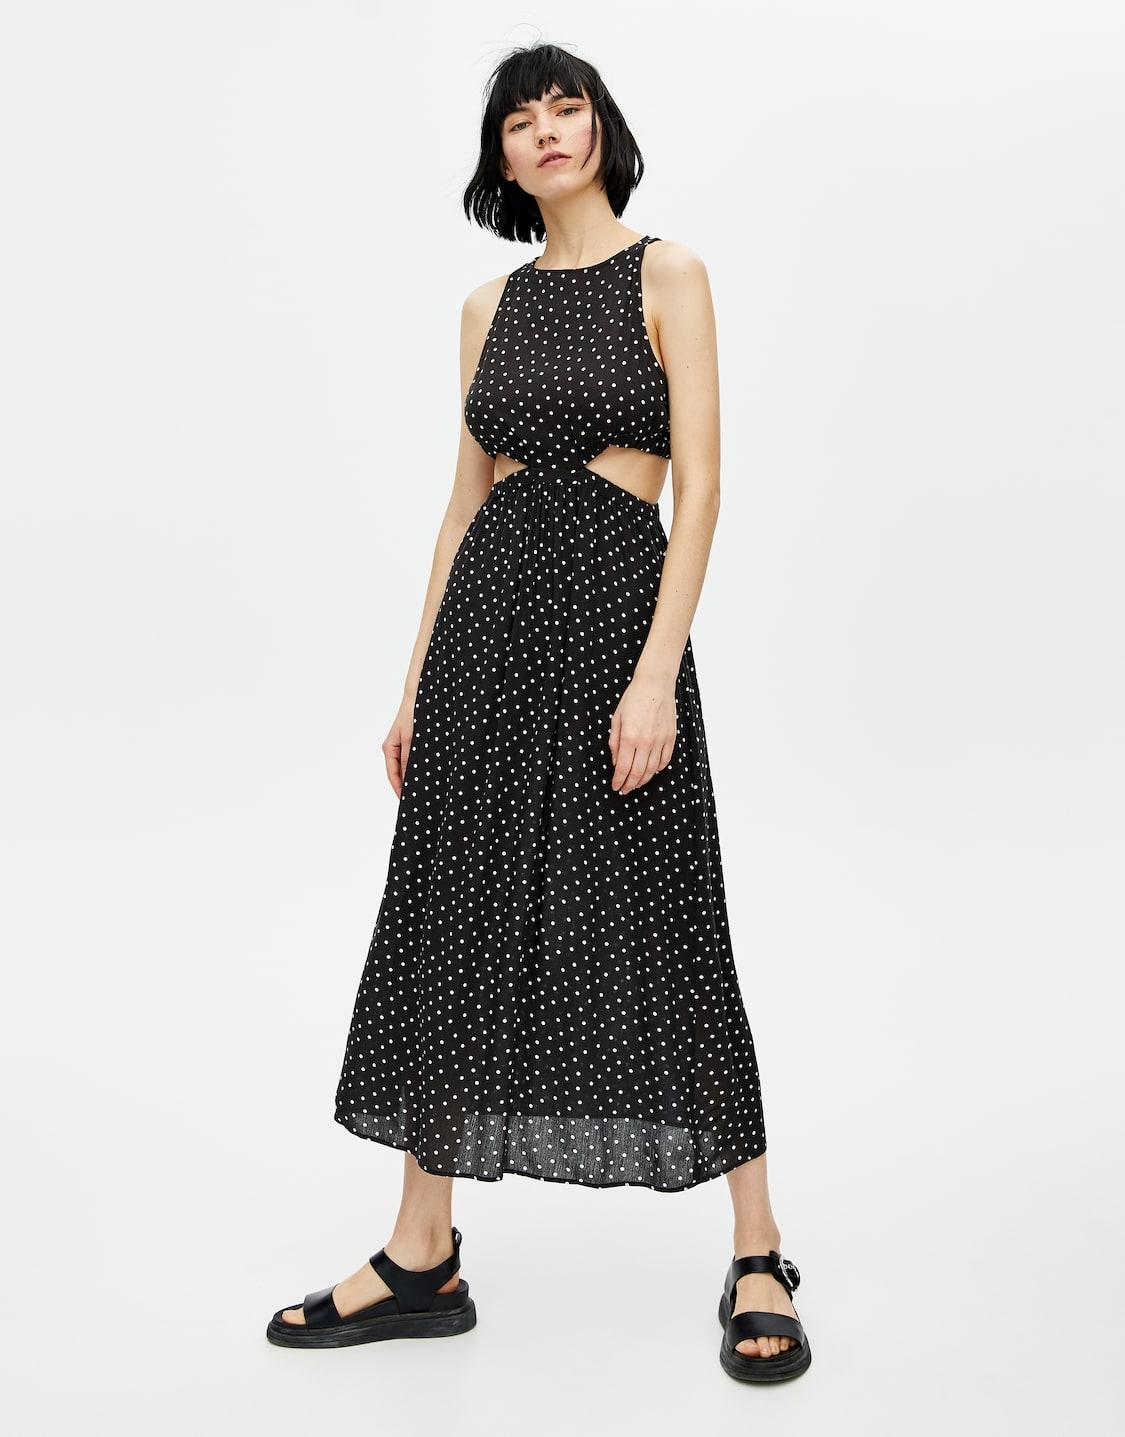 d04938400a2 Μίντι φόρεμα πουά με κοψίματα. Κωδικός προϊόντος 5390413